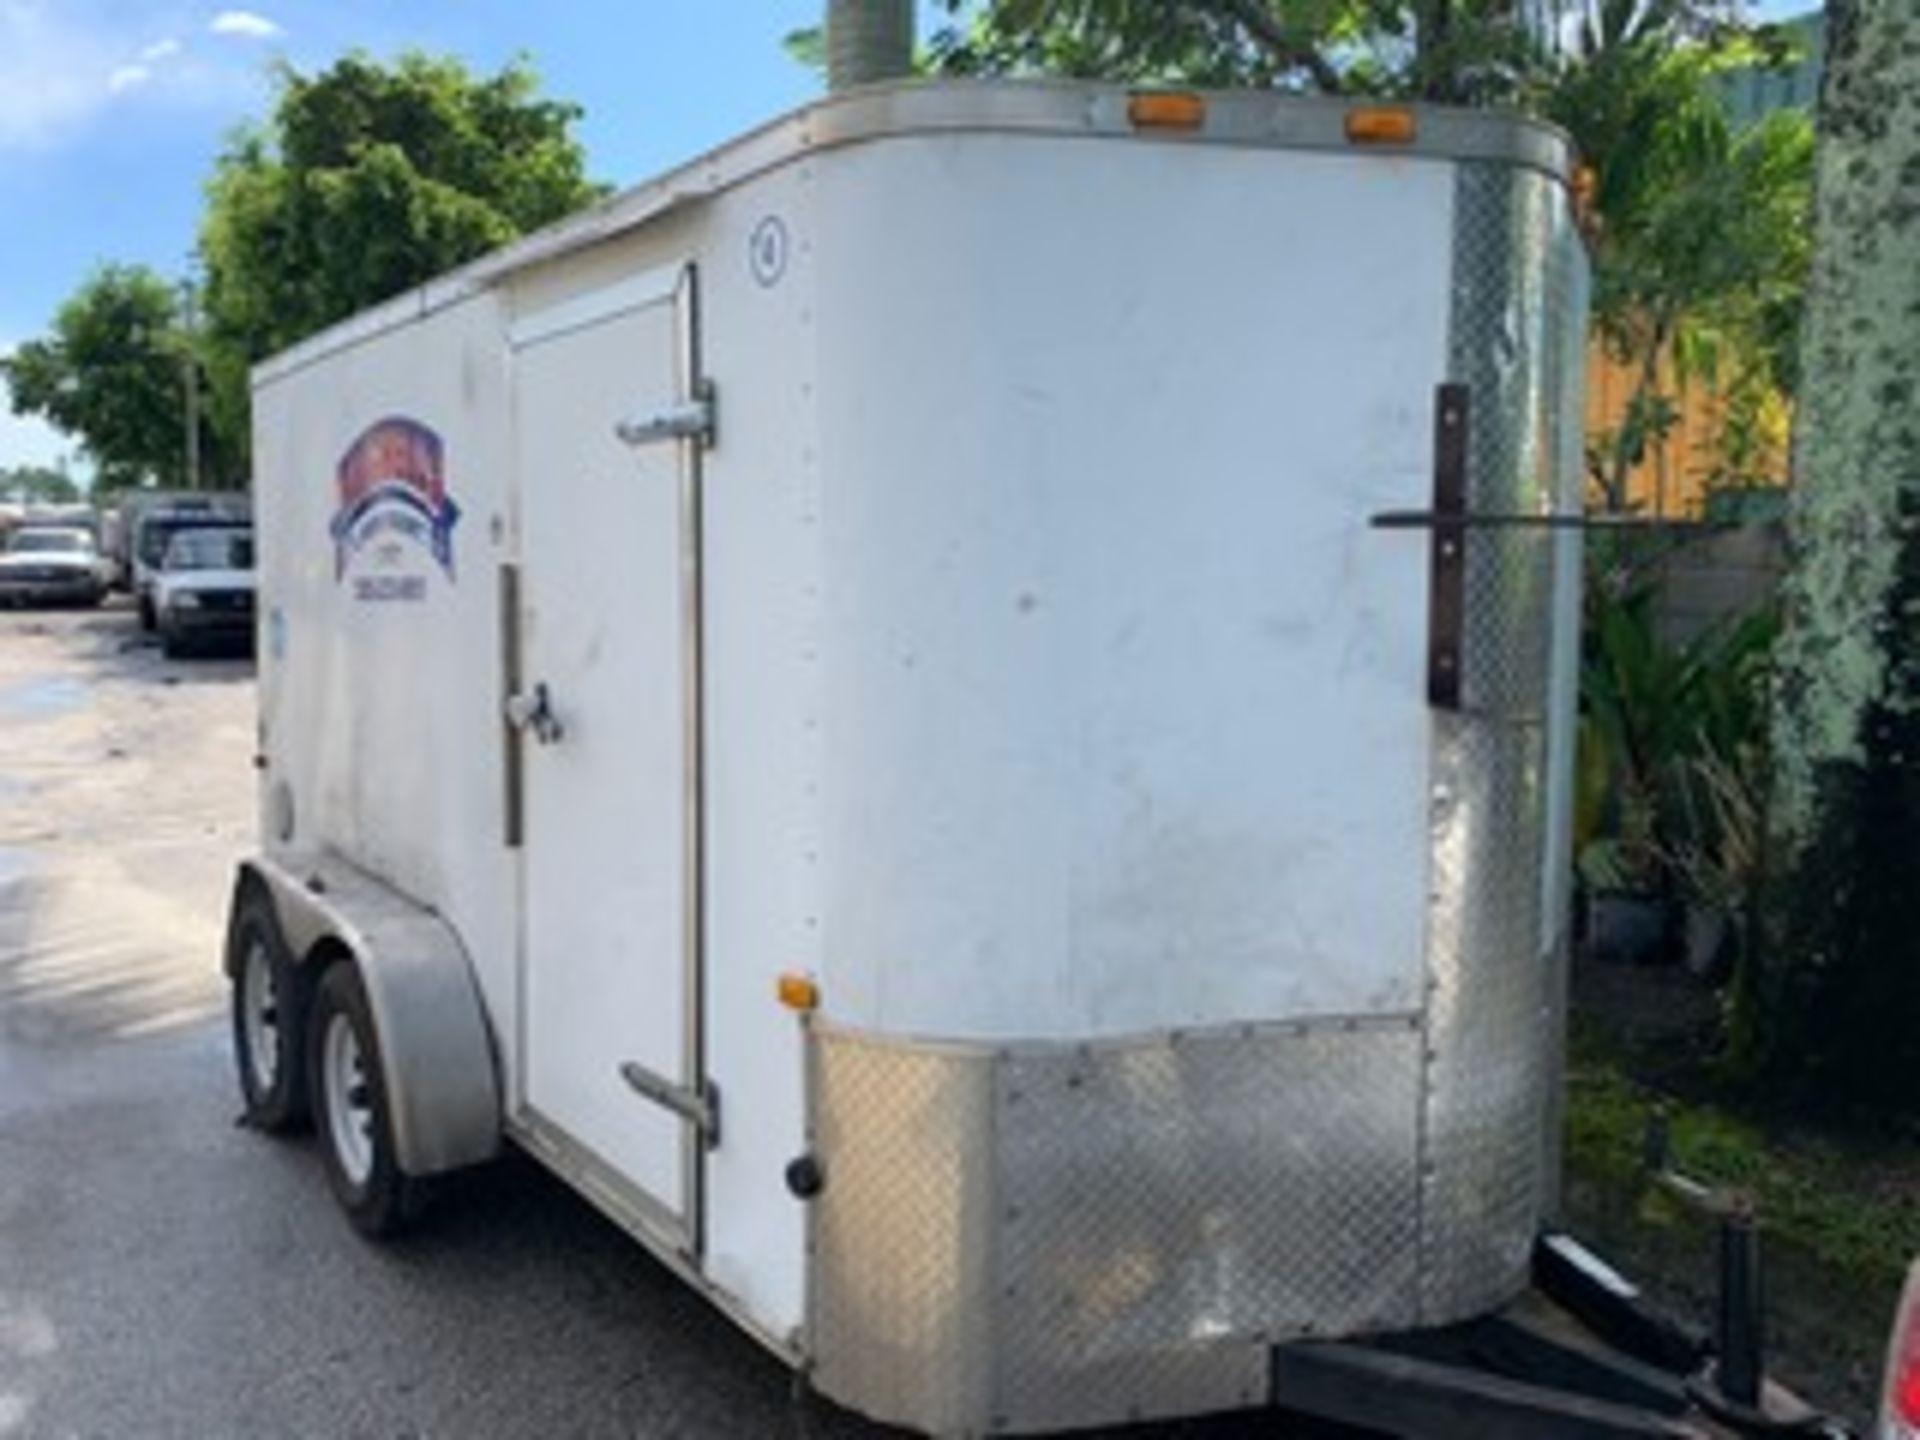 Lot 722 - 2015 CARGO CRAFT ENCLOSED TRAILER - VIN #4D6EB1423FA035676 - WHITE - DUAL AXLE - SIDE DOOR - 18' (4)